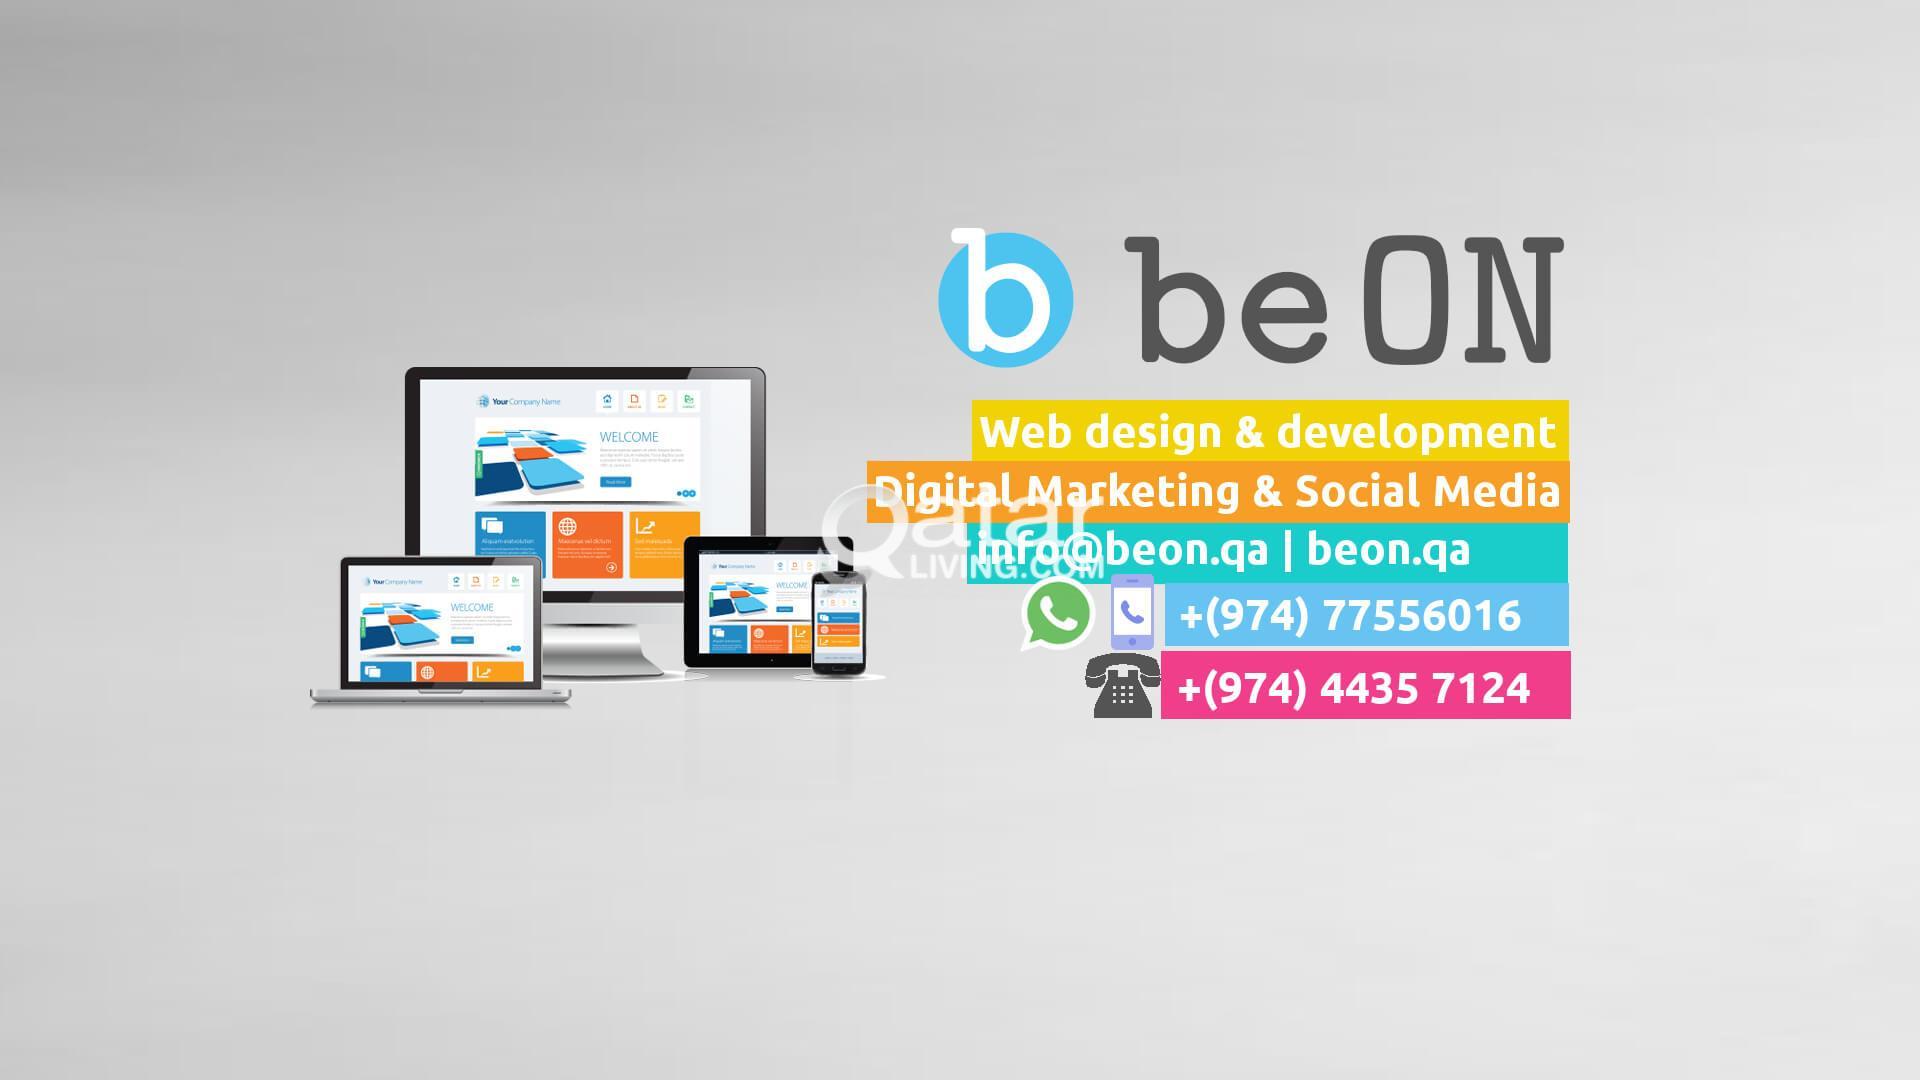 Web Design Company & Web Development Services | Qatar Living